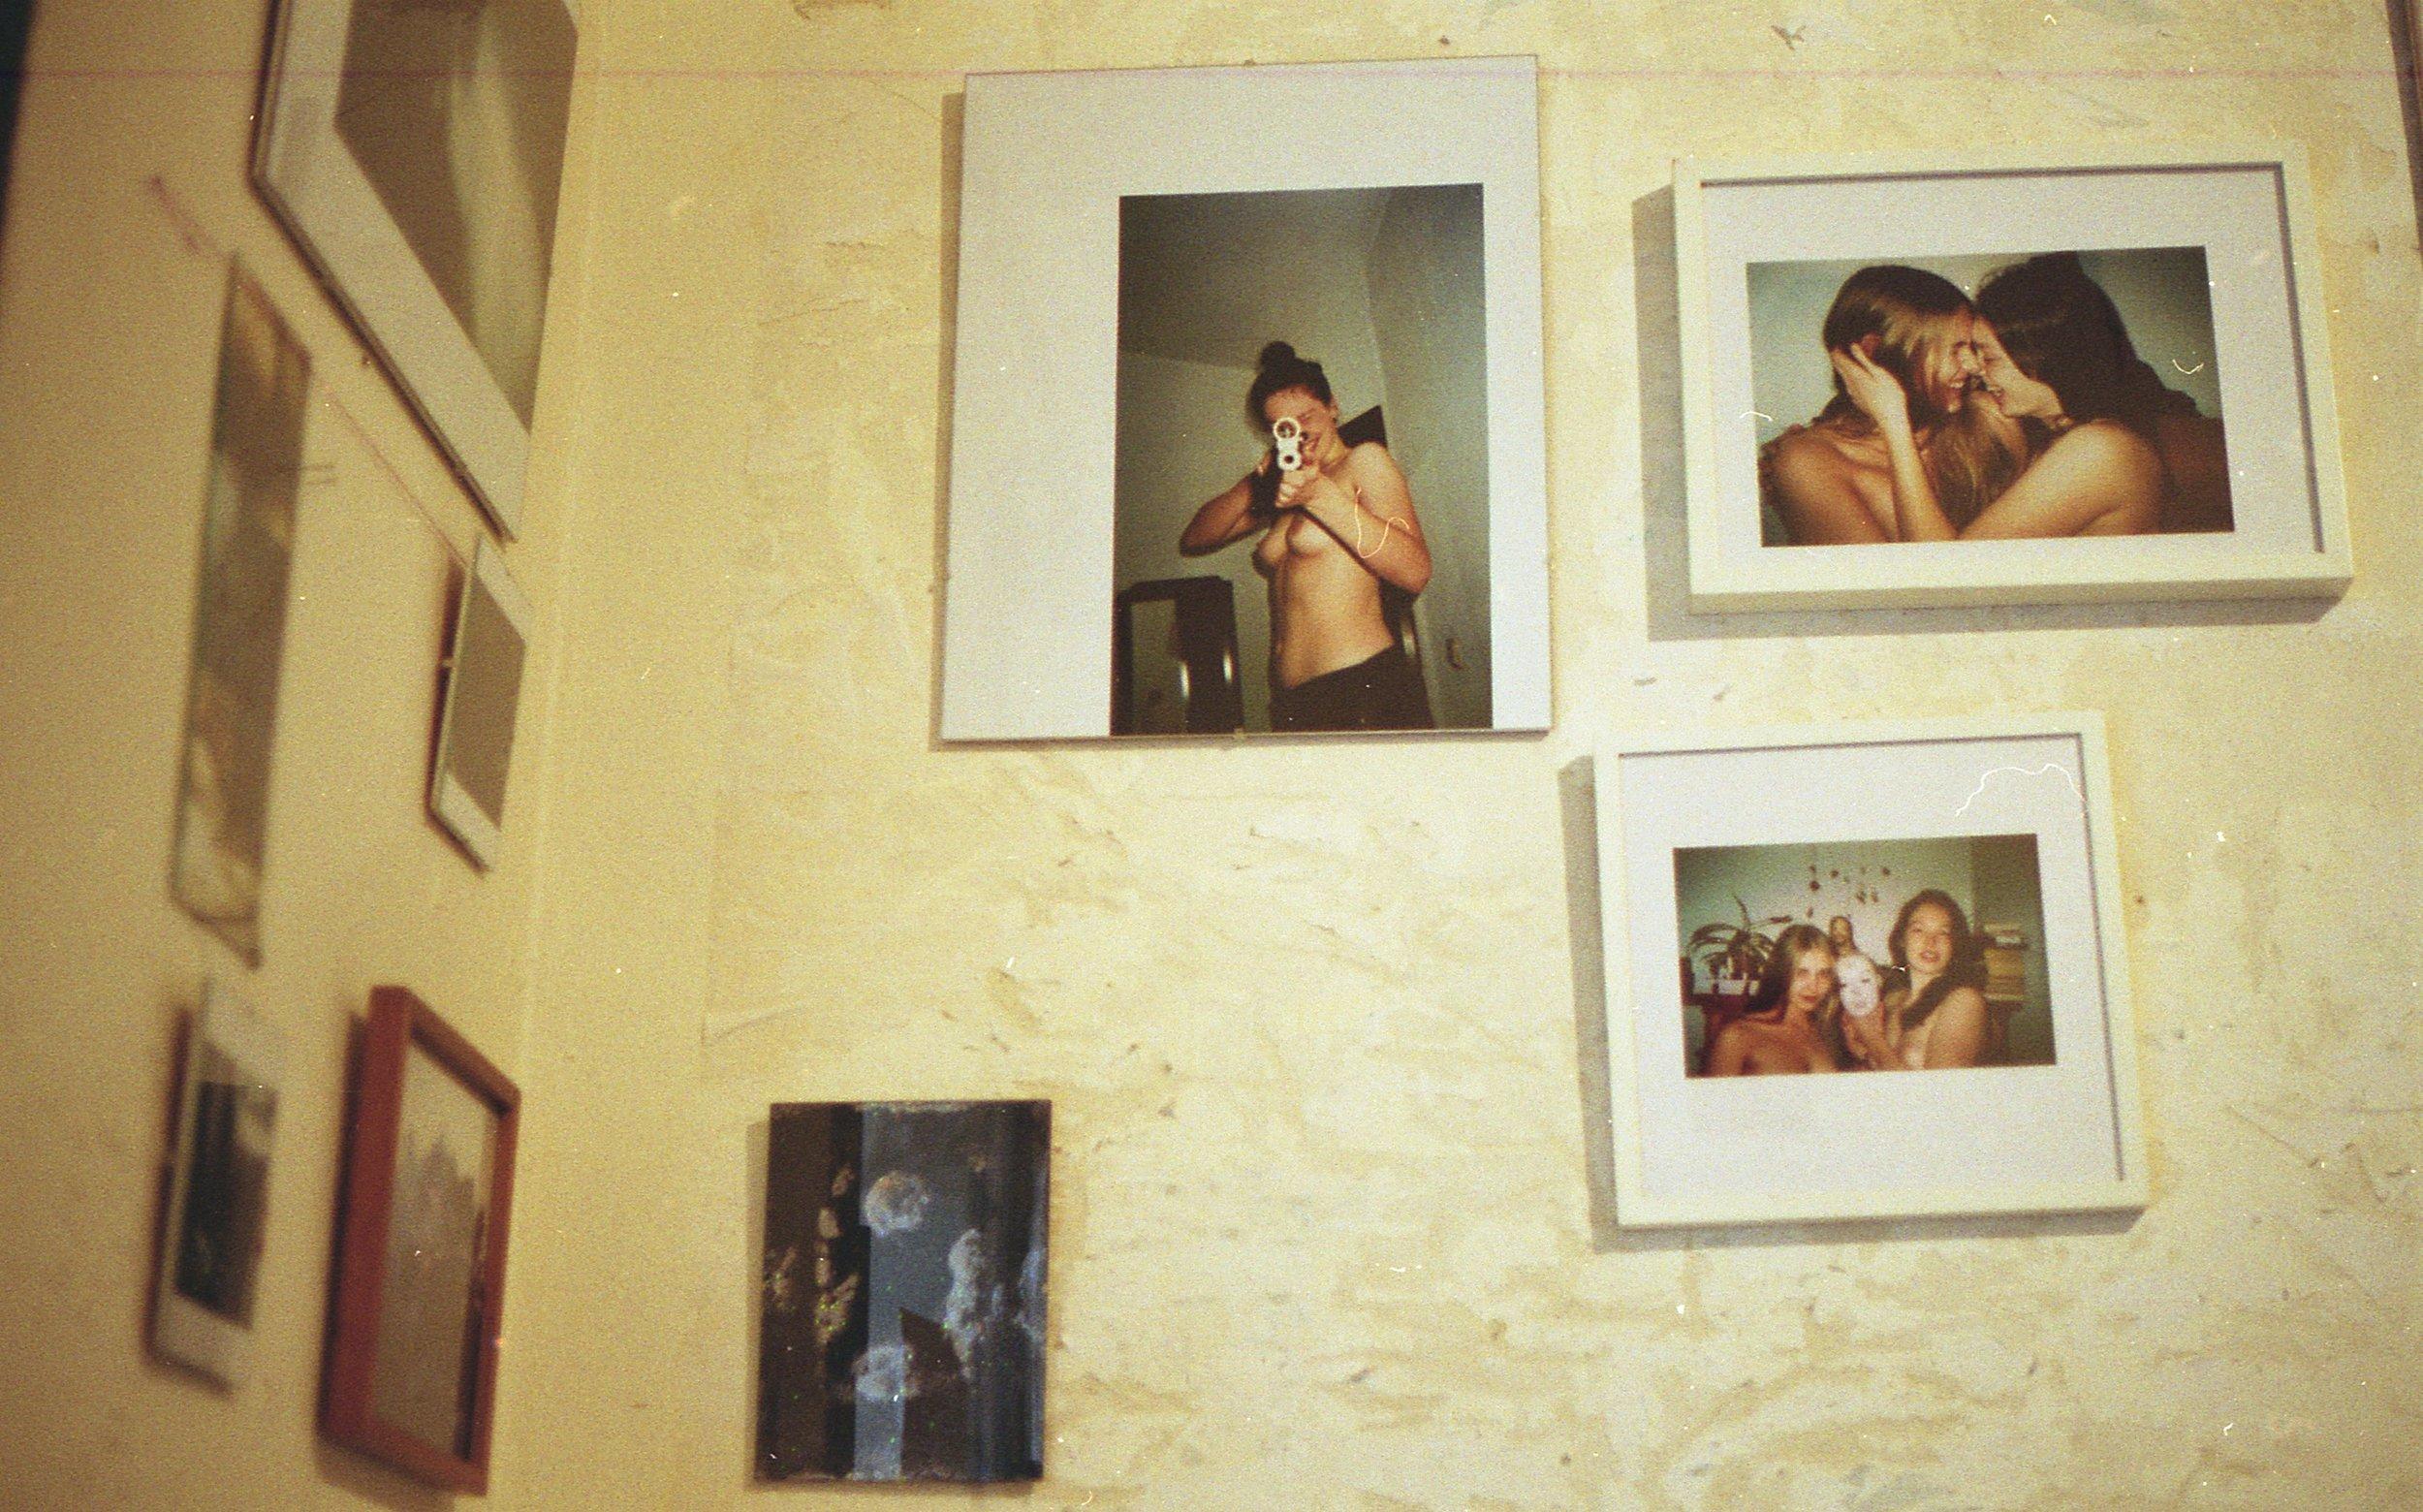 photos around the corner .jpg